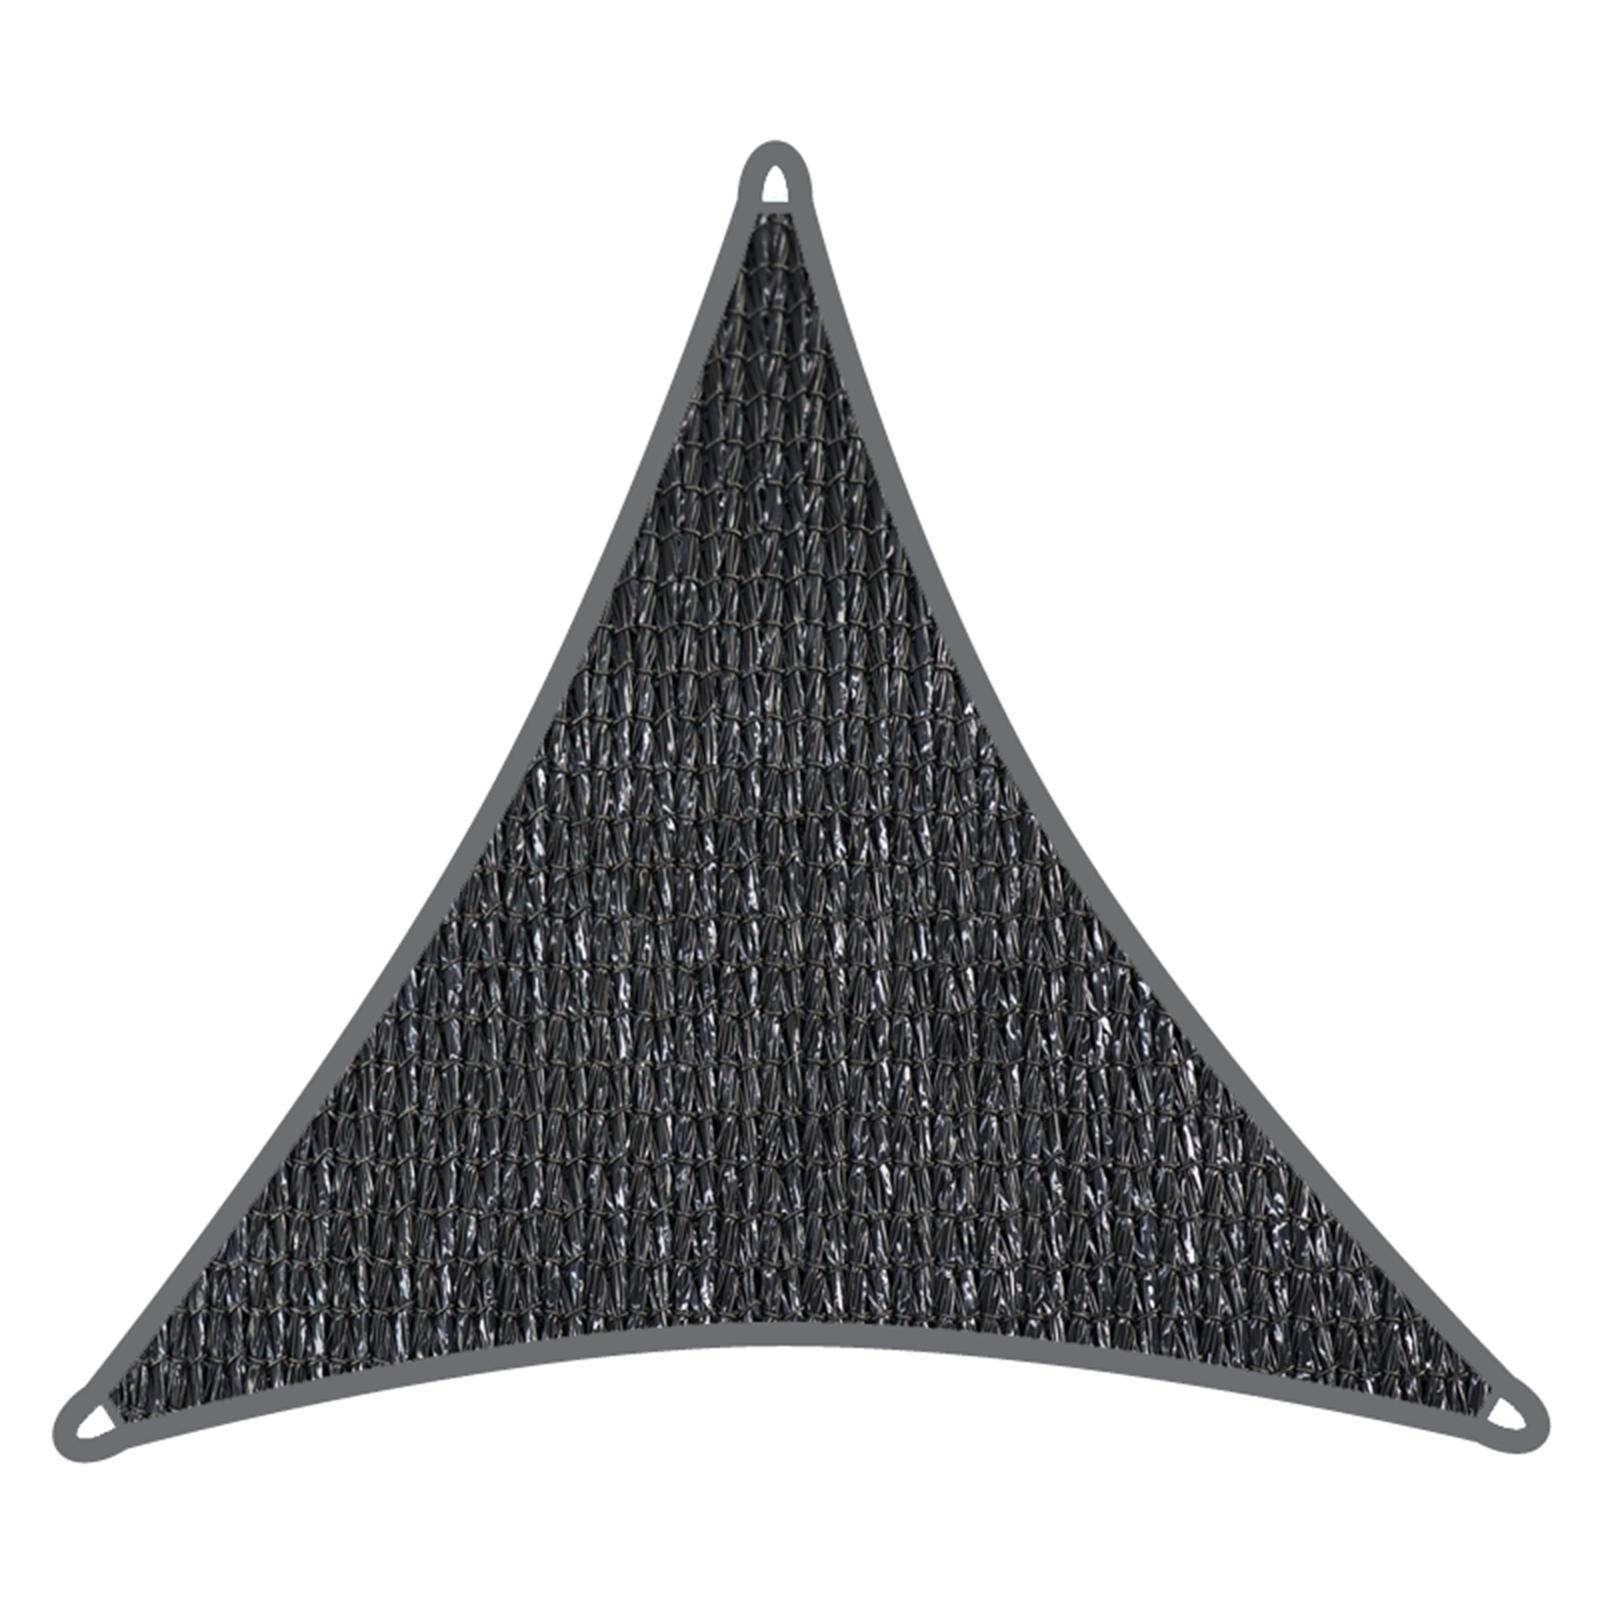 Coolaroo 5.0m Graphite Triangle Commercial Grade Shade Sail